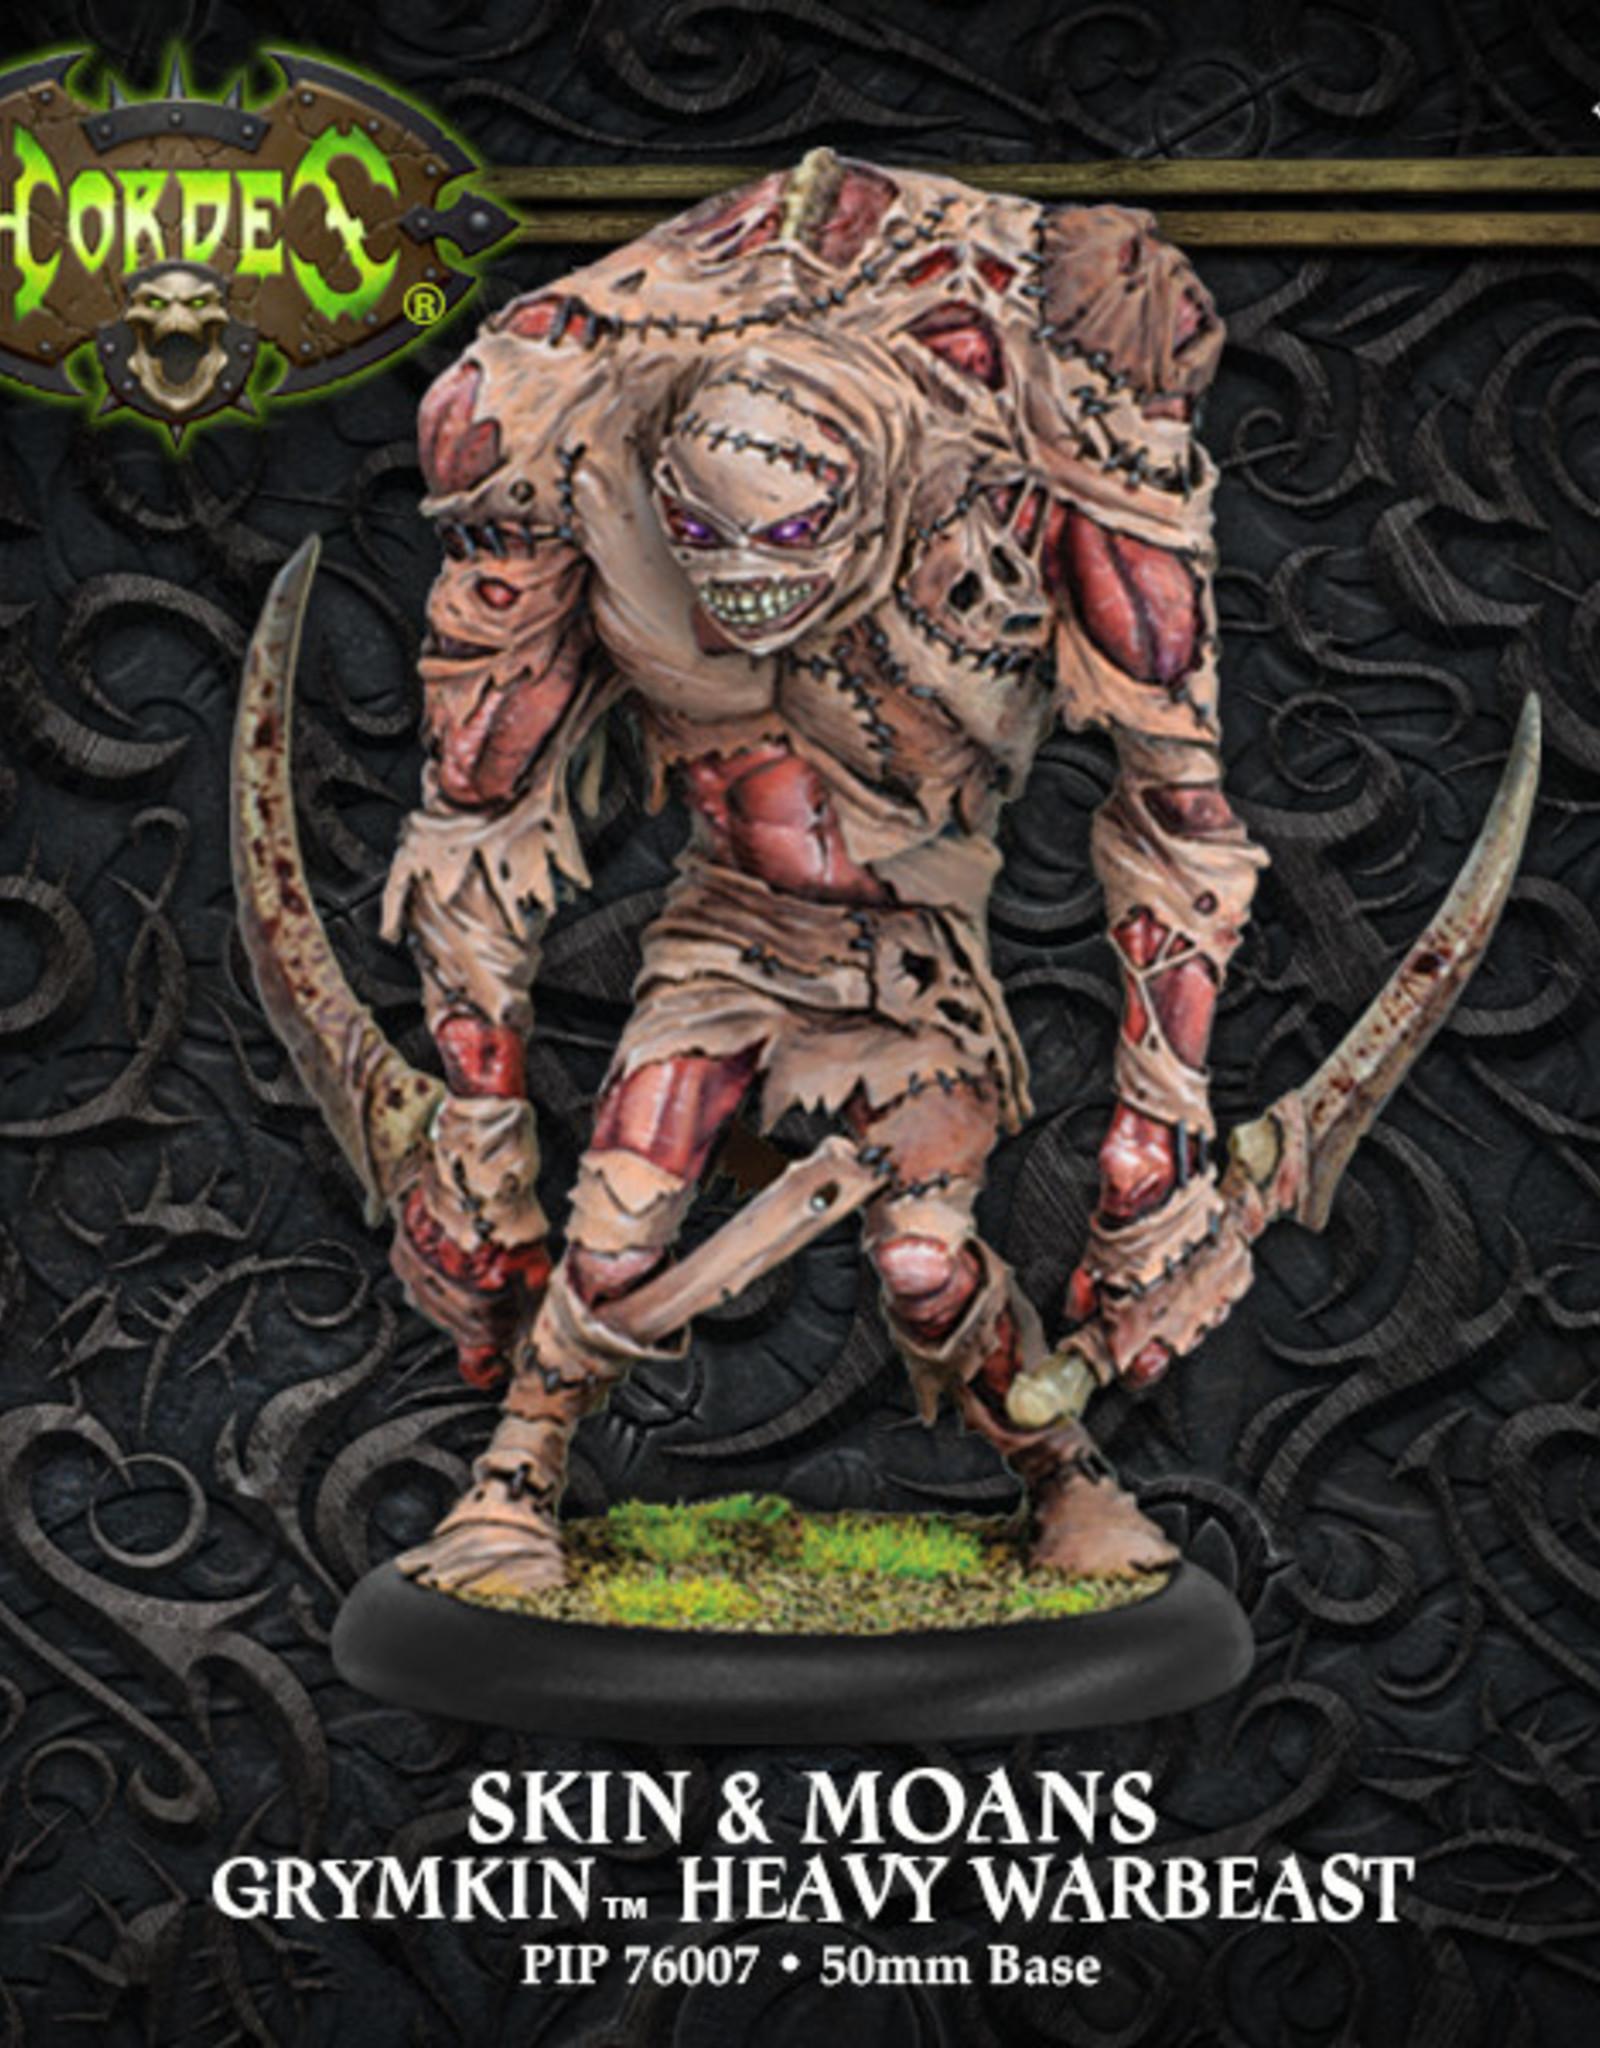 Hordes Grymkin - Skin & Moans